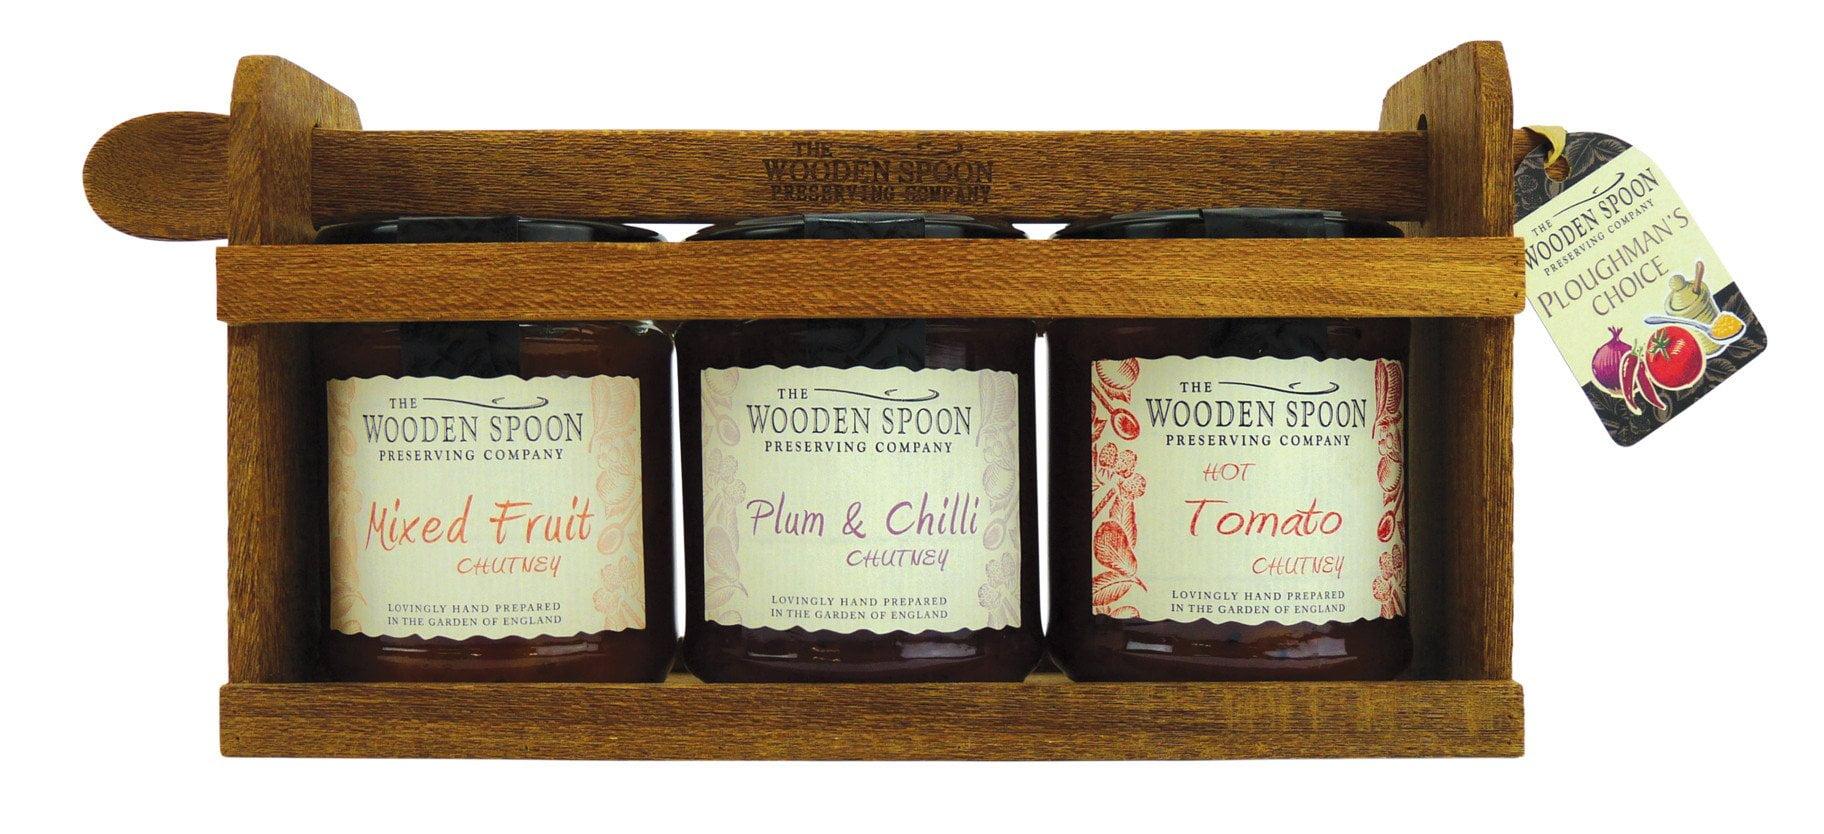 Ploughman's Choice: Hot Tomato Chutney, Fruit Chutney, Plum & Chilli Chutney 3 x 284g